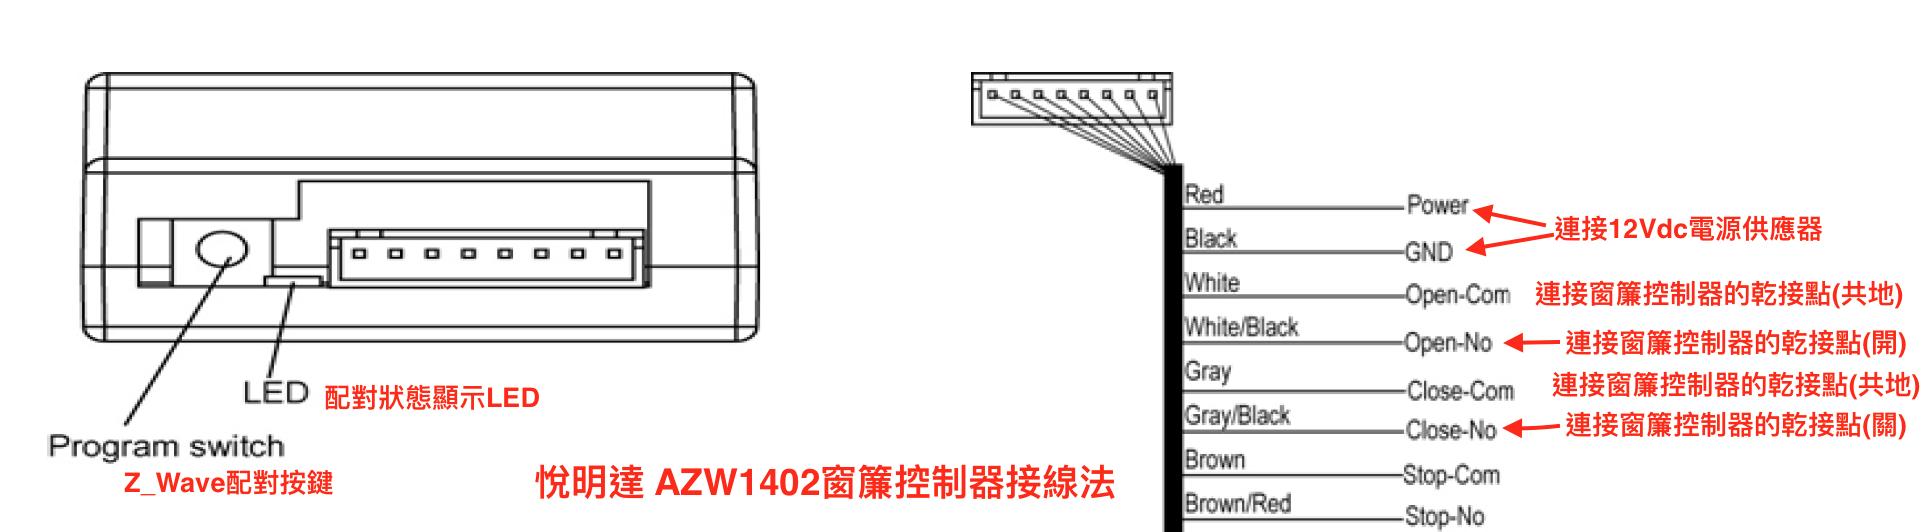 AZW4102 無線窗簾控制器